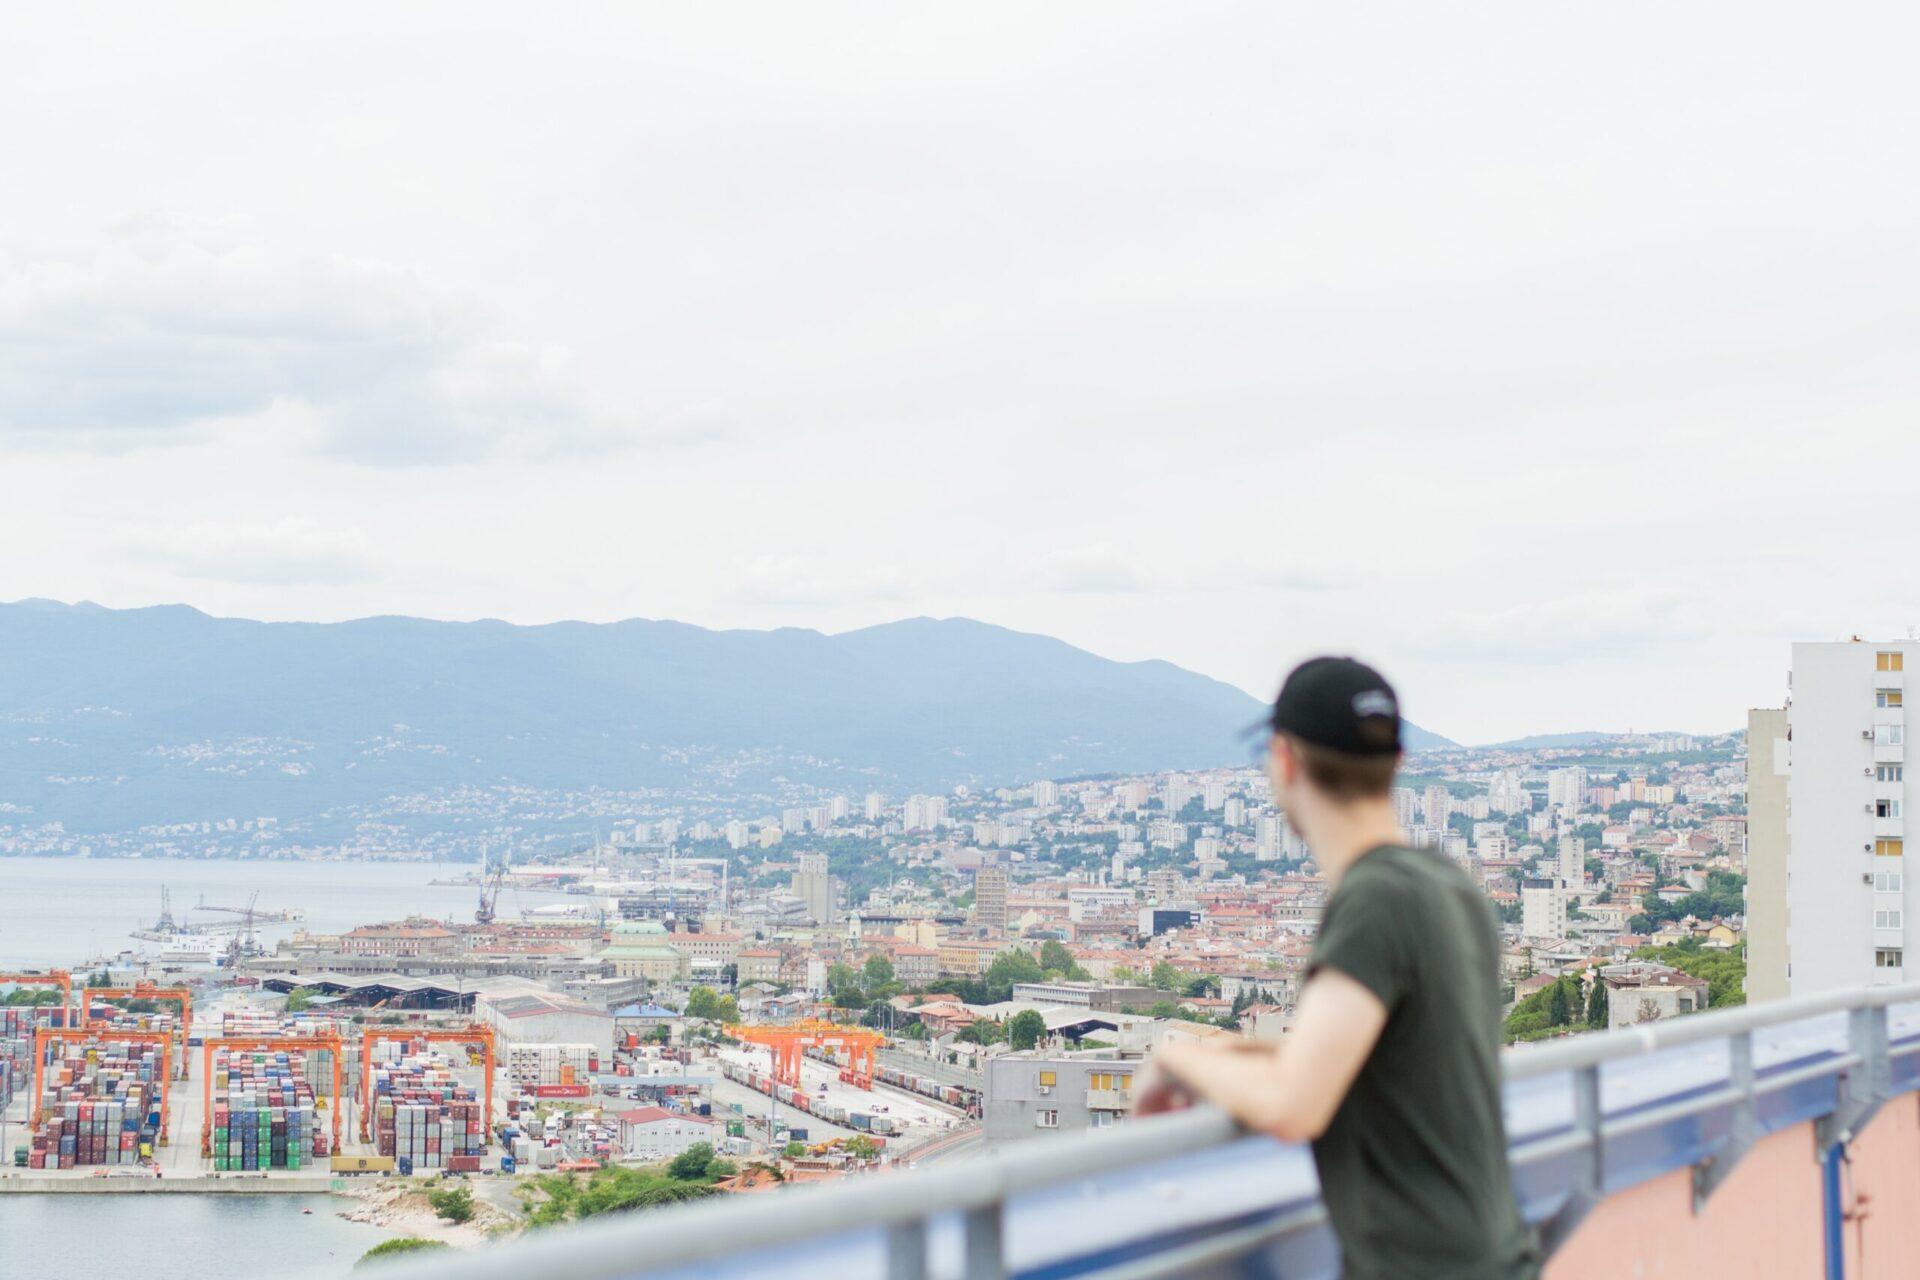 man standing on railing overlooking city buildings